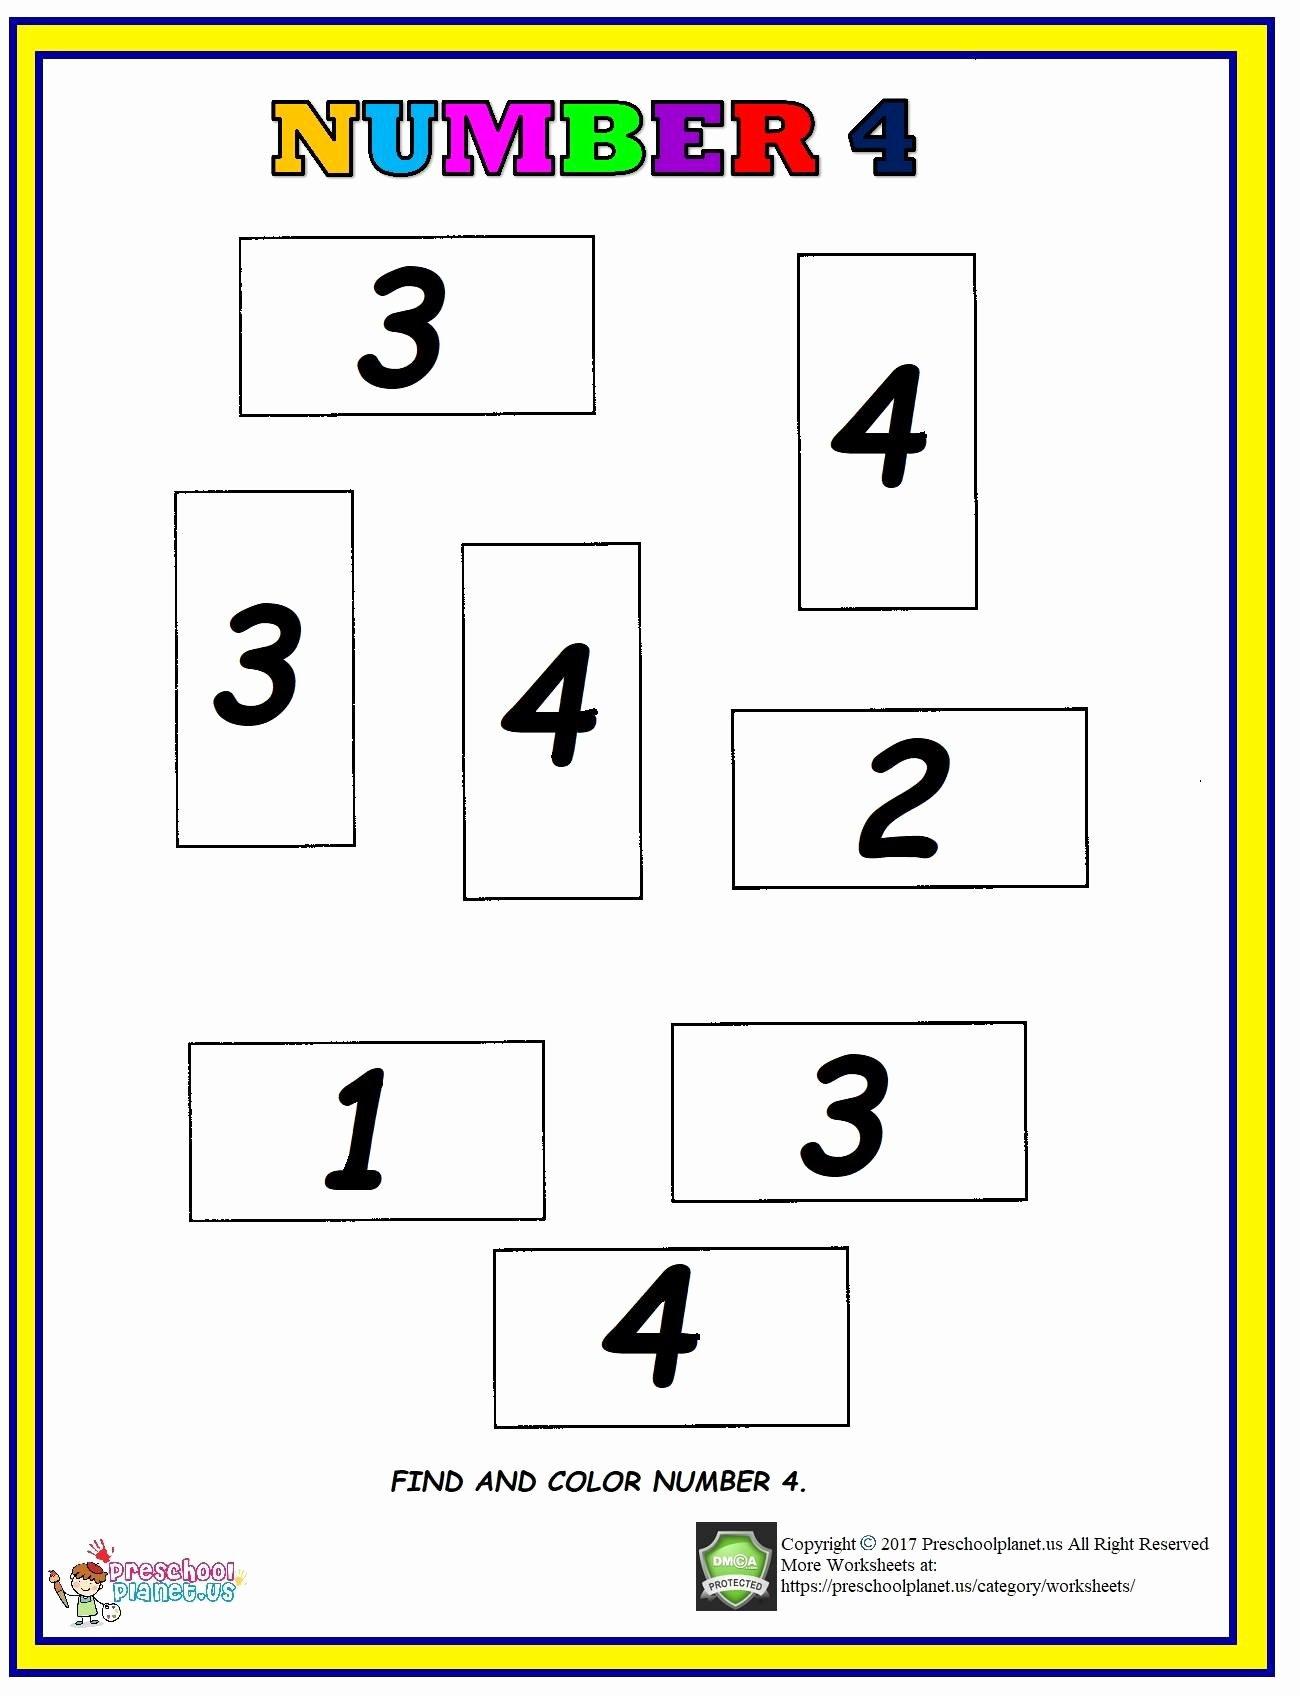 Number 4 Worksheets For Preschoolers